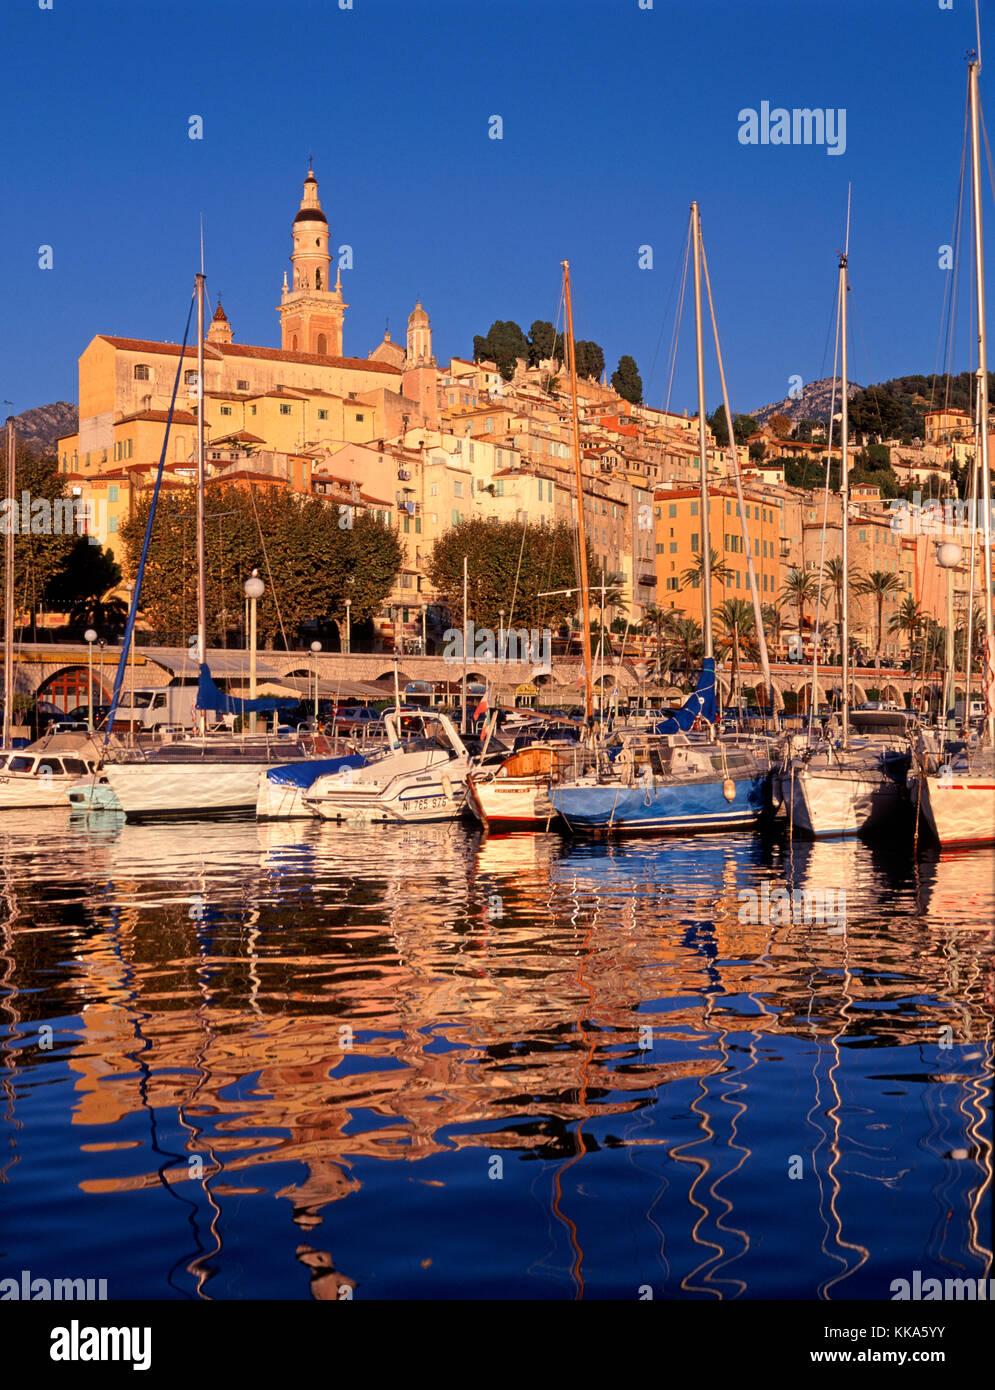 Menton marina, Cote d'Azur,Alpes Maritimes, French Riviera, France - Stock Image